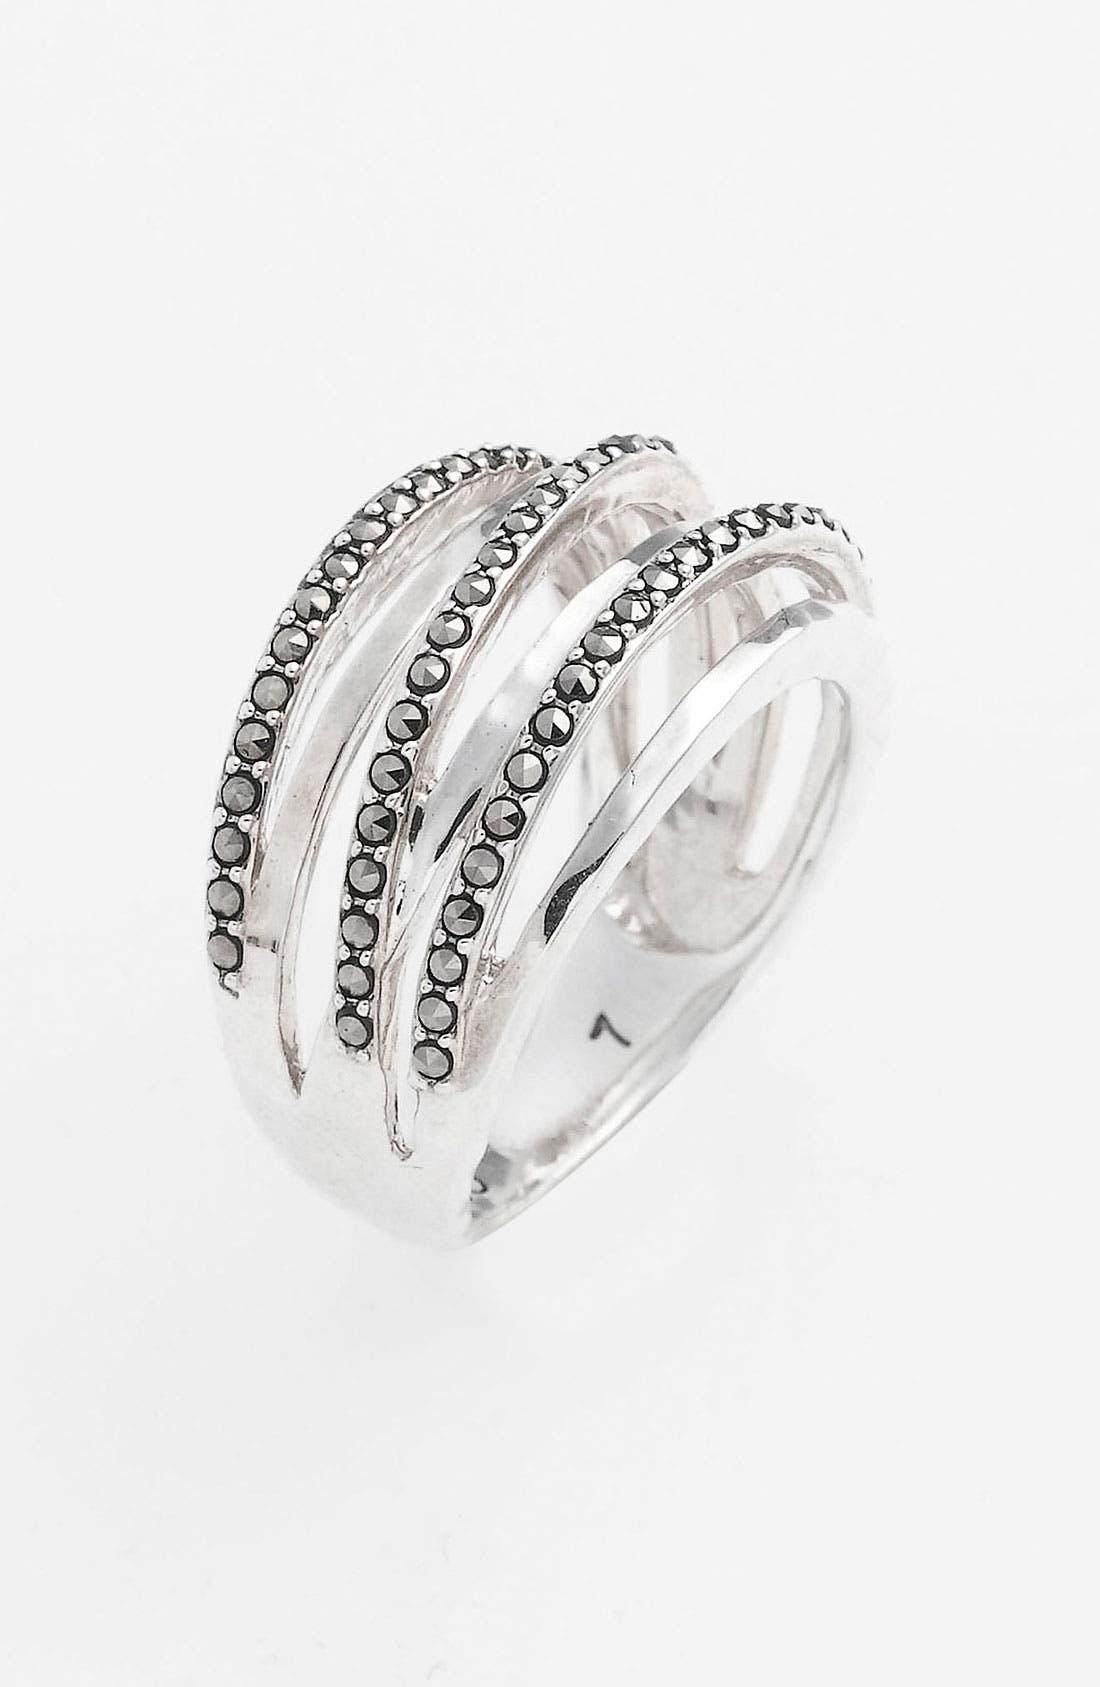 Main Image - Judith Jack 'Fluidity' Ring